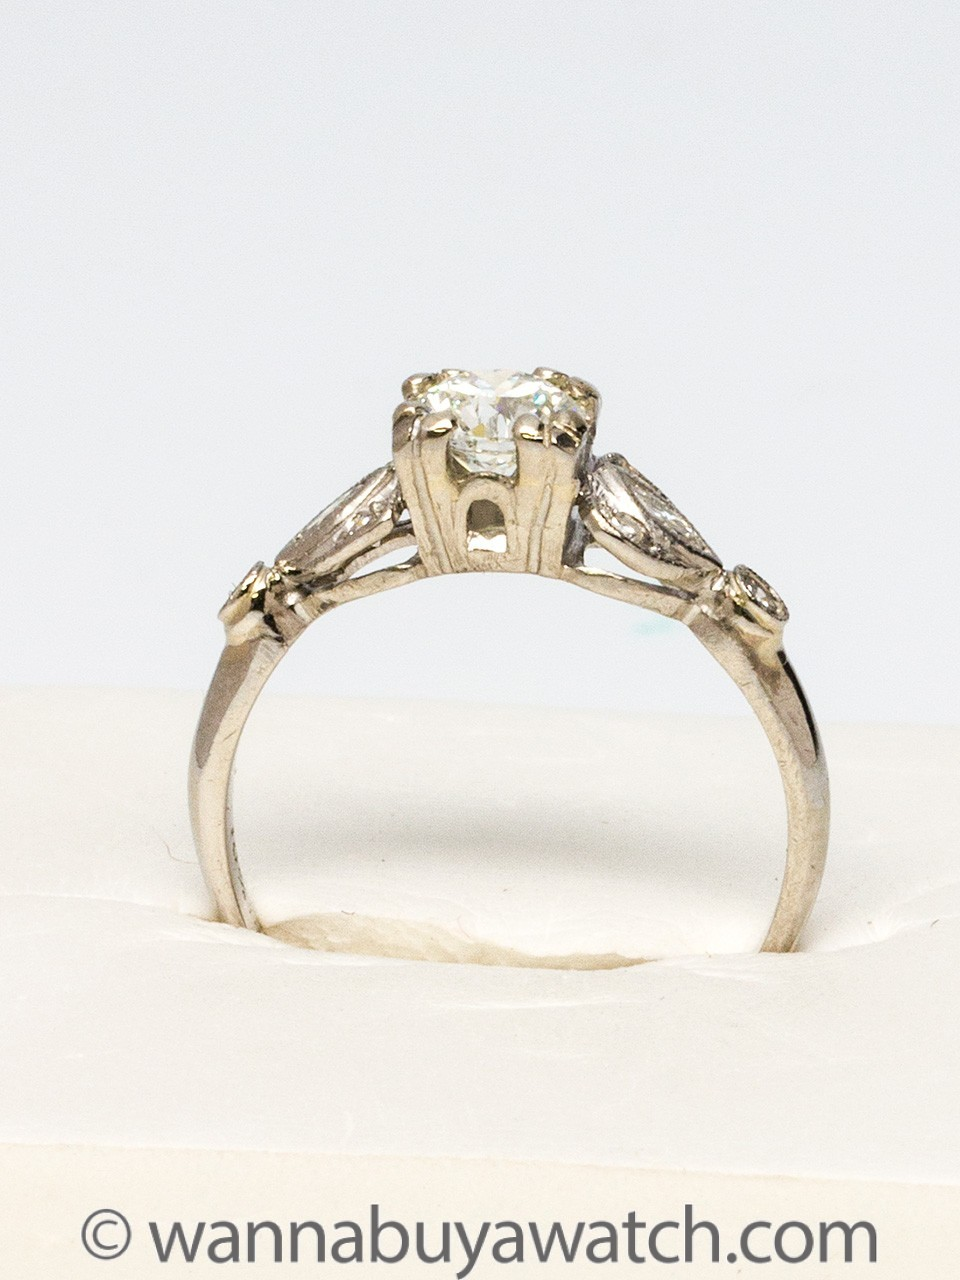 Vintage Platinum Engagement Ring 0.51ct Transition Cut Diamond c.1940s